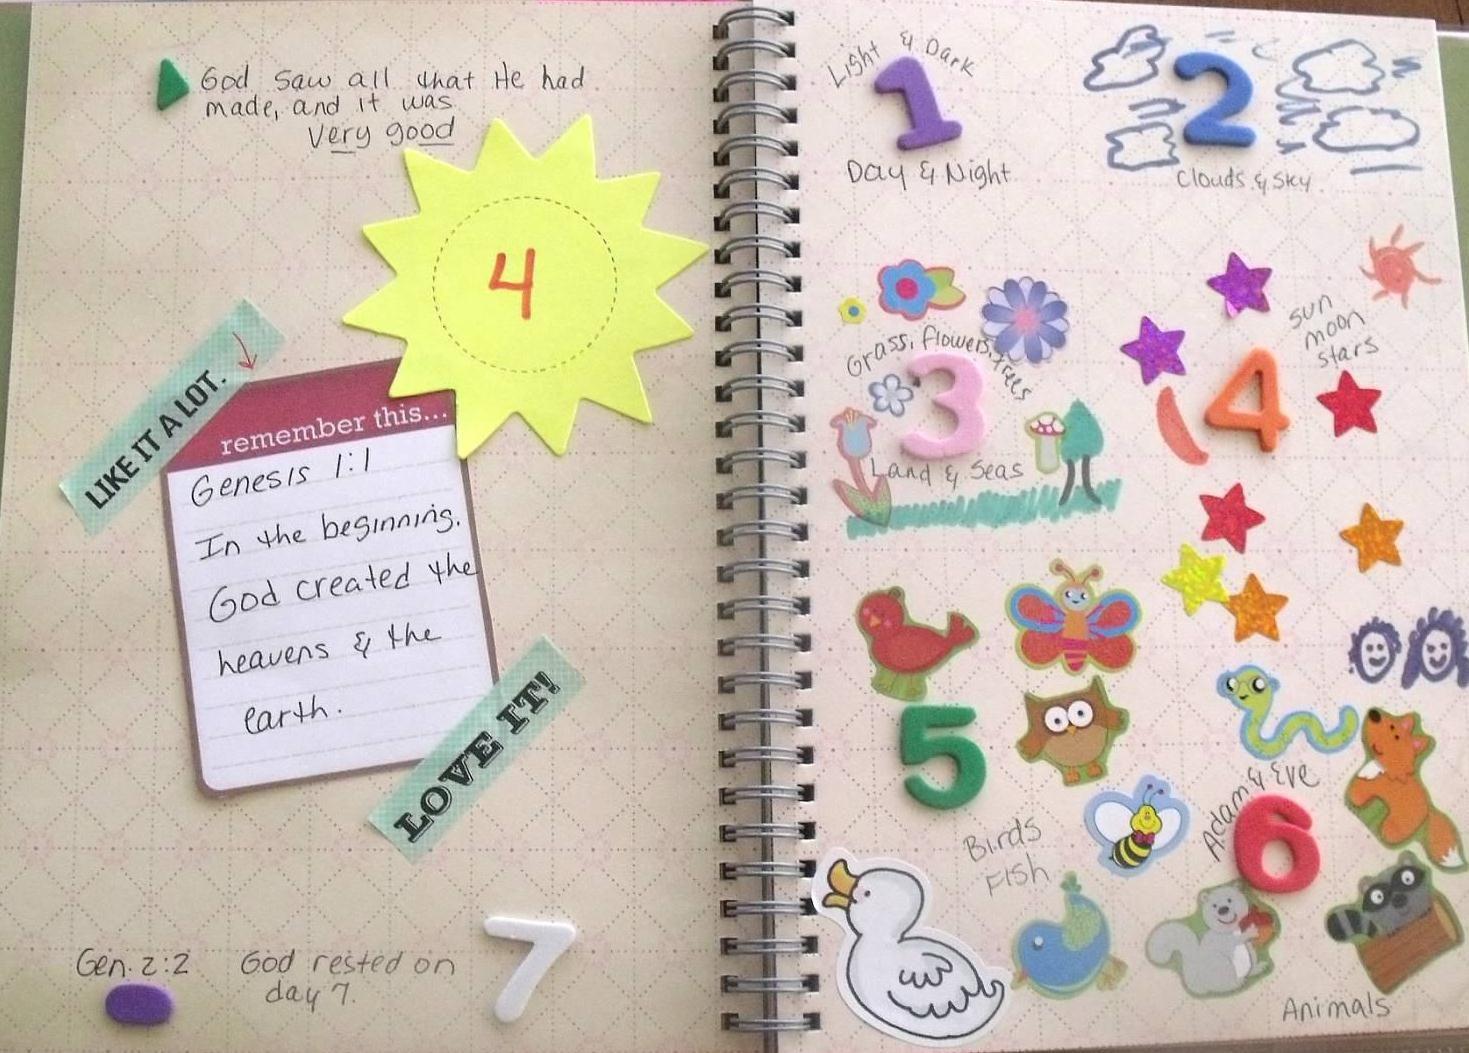 Bible Verse Journal - FFN thought!!